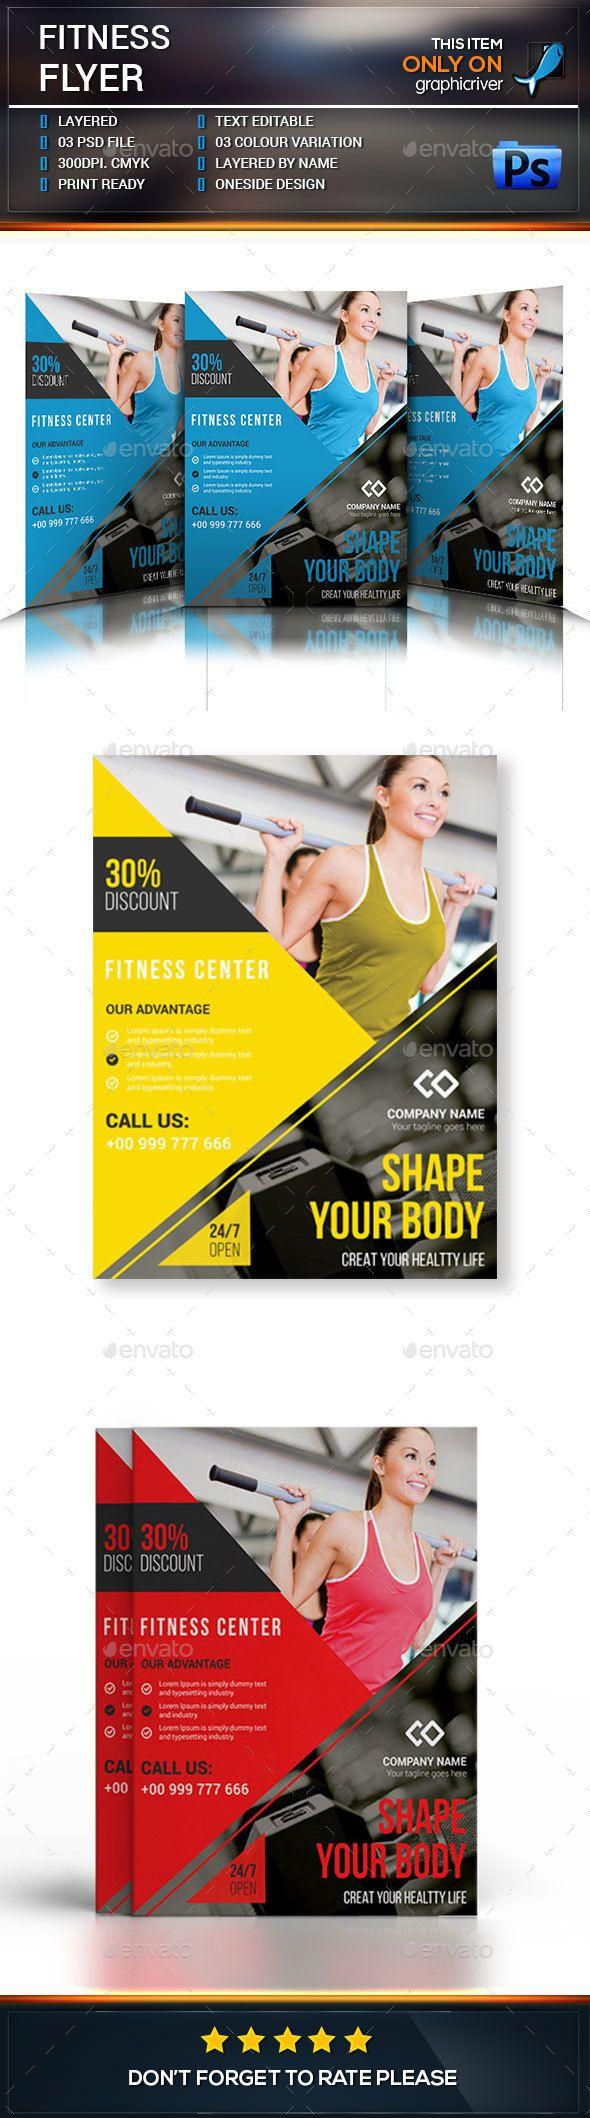 7 Best Fitness Flyer Template Images On Pinterest Fitness Flyer